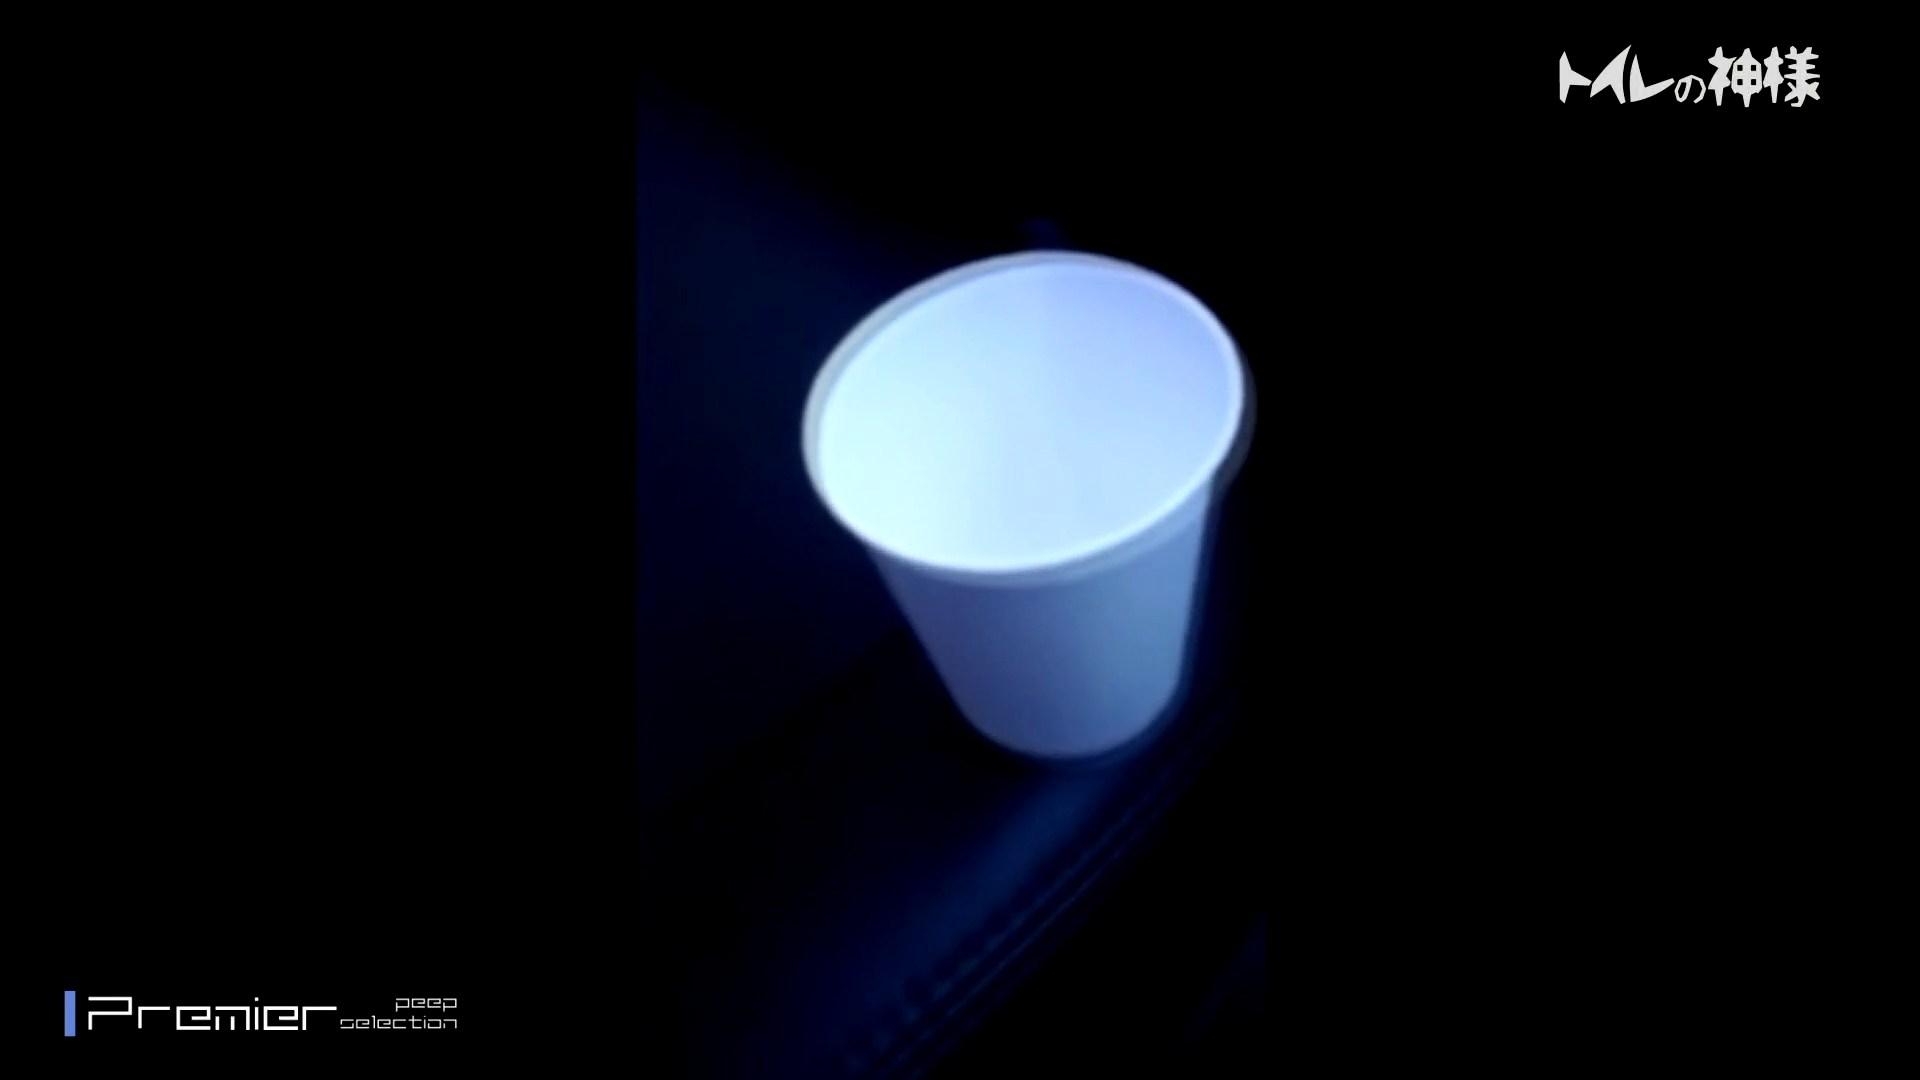 kyouko排泄 うんこをたくさん集めました。トイレの神様 Vol.14 トイレ中の女子達 セックス無修正動画無料 19連発 19